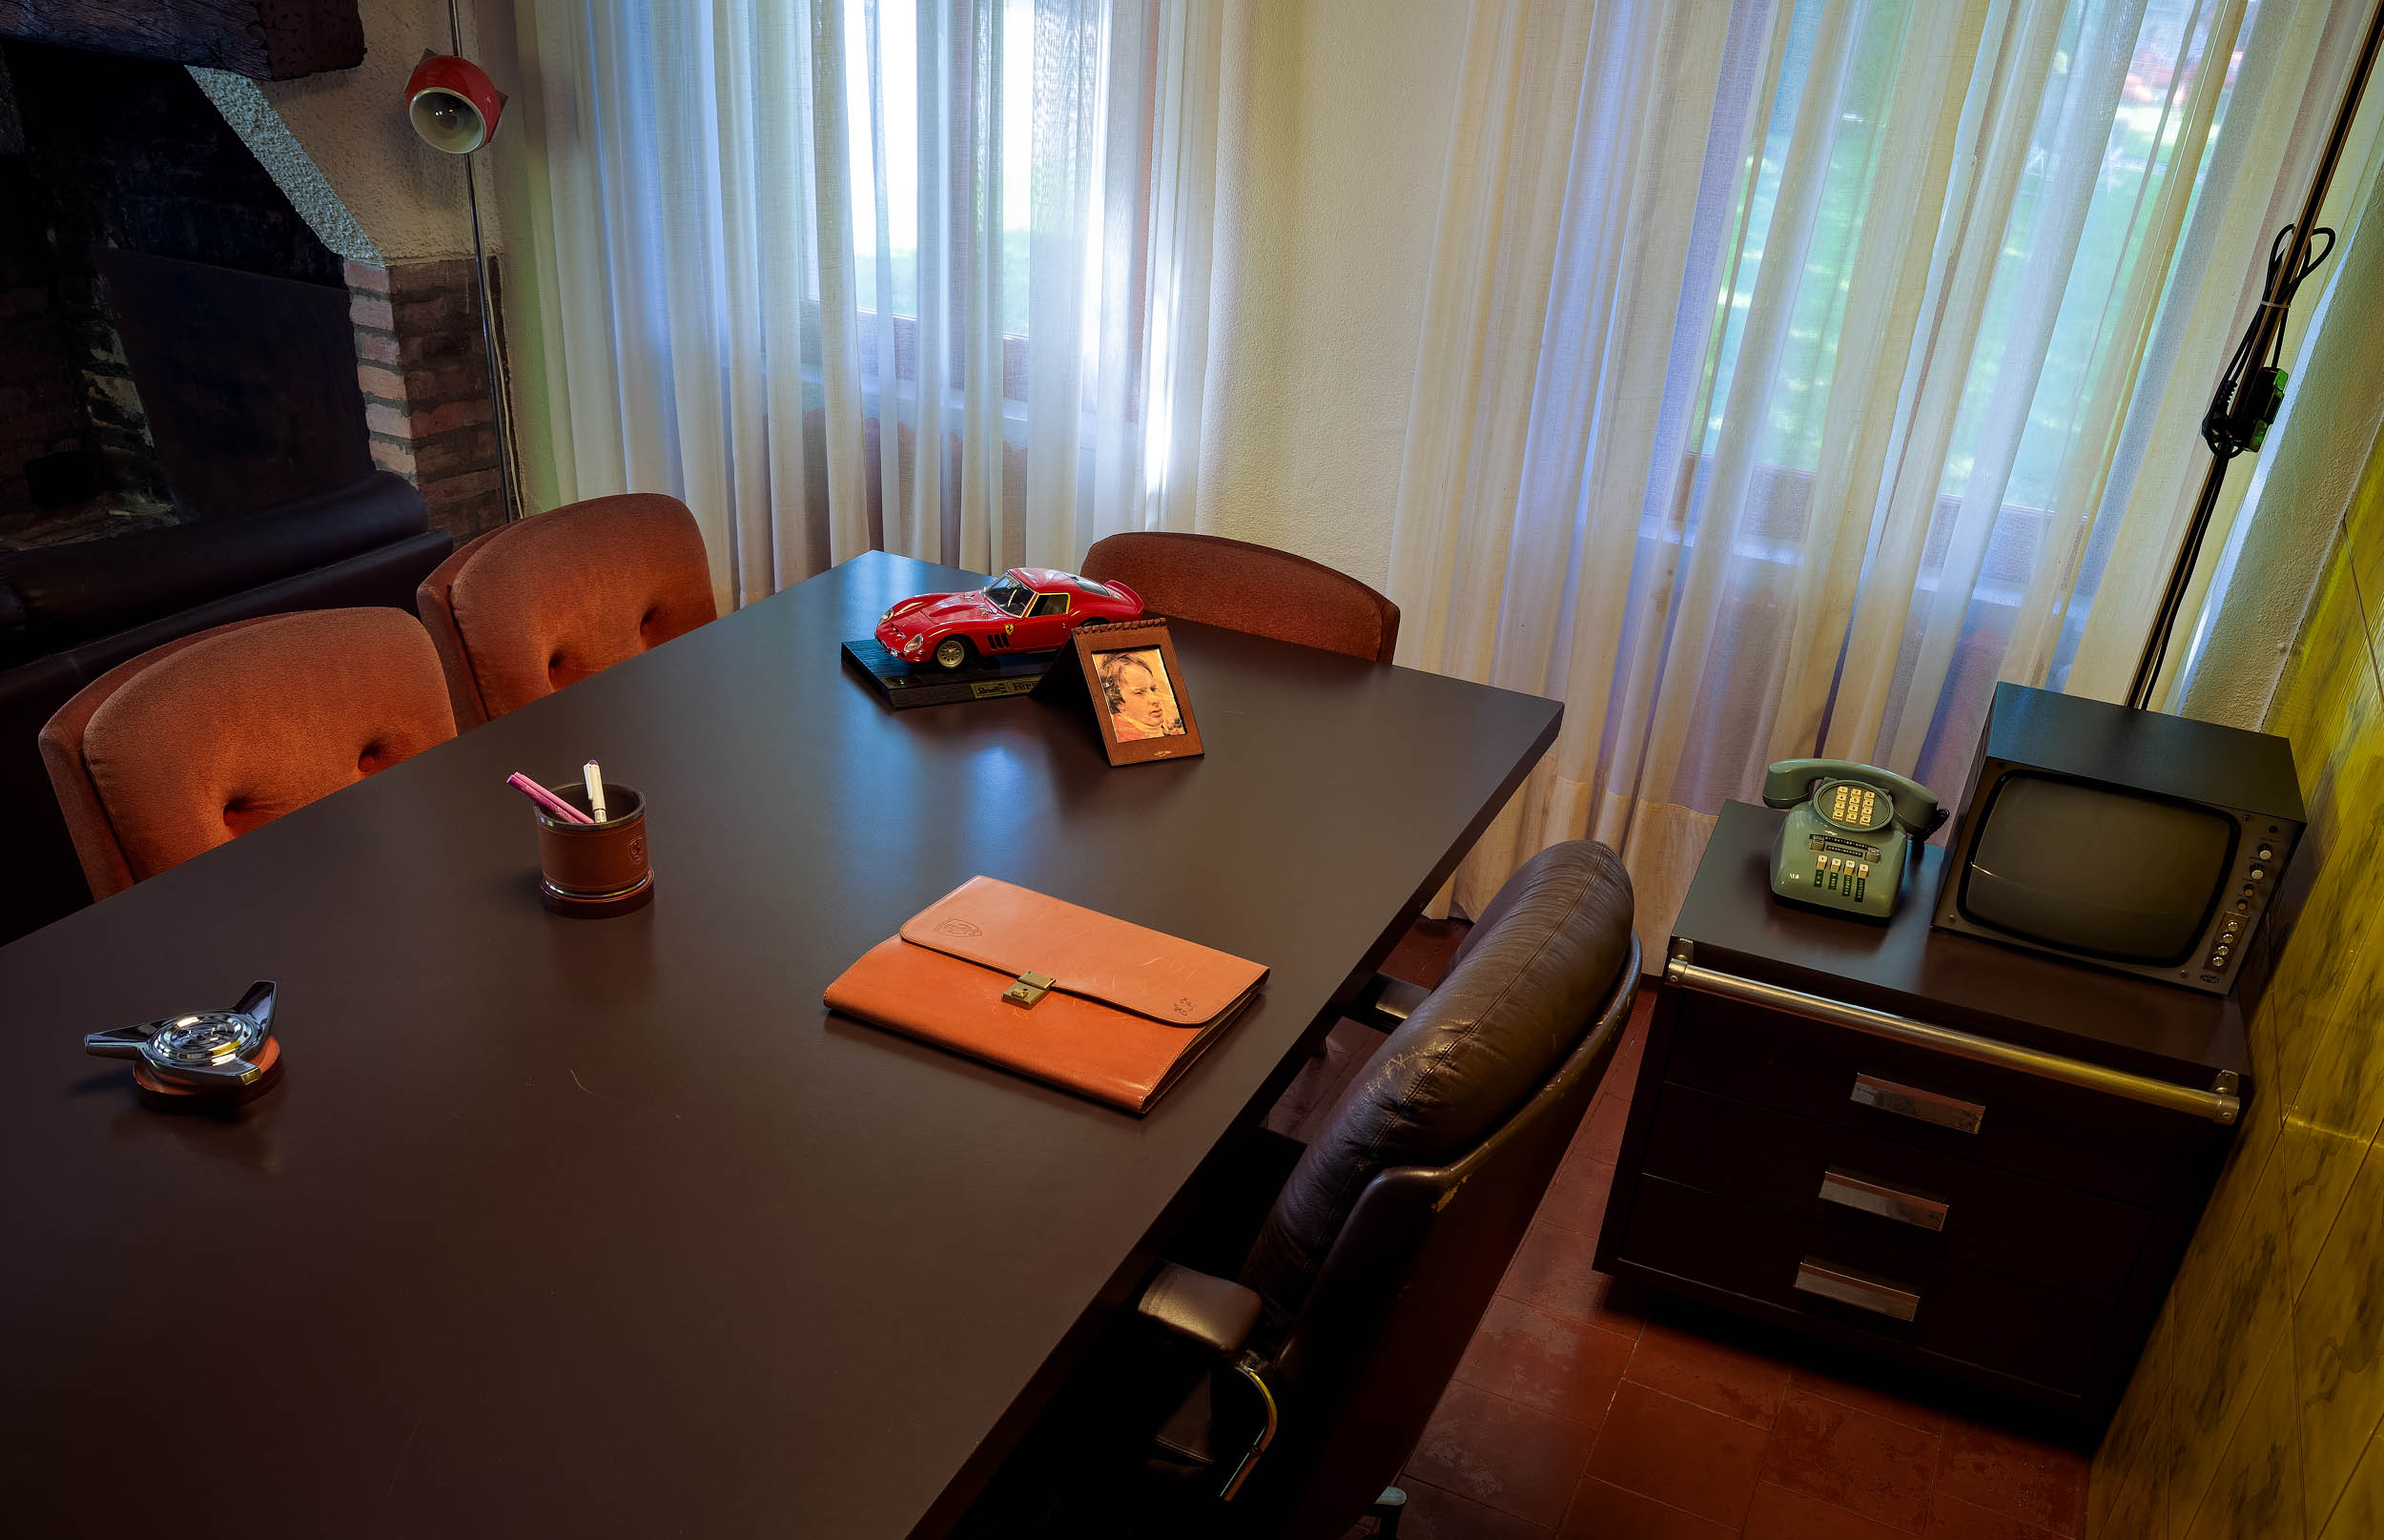 Enzo Ferrari's Desk with a Model 250GTO and a Picture of Gilles Villeneuve